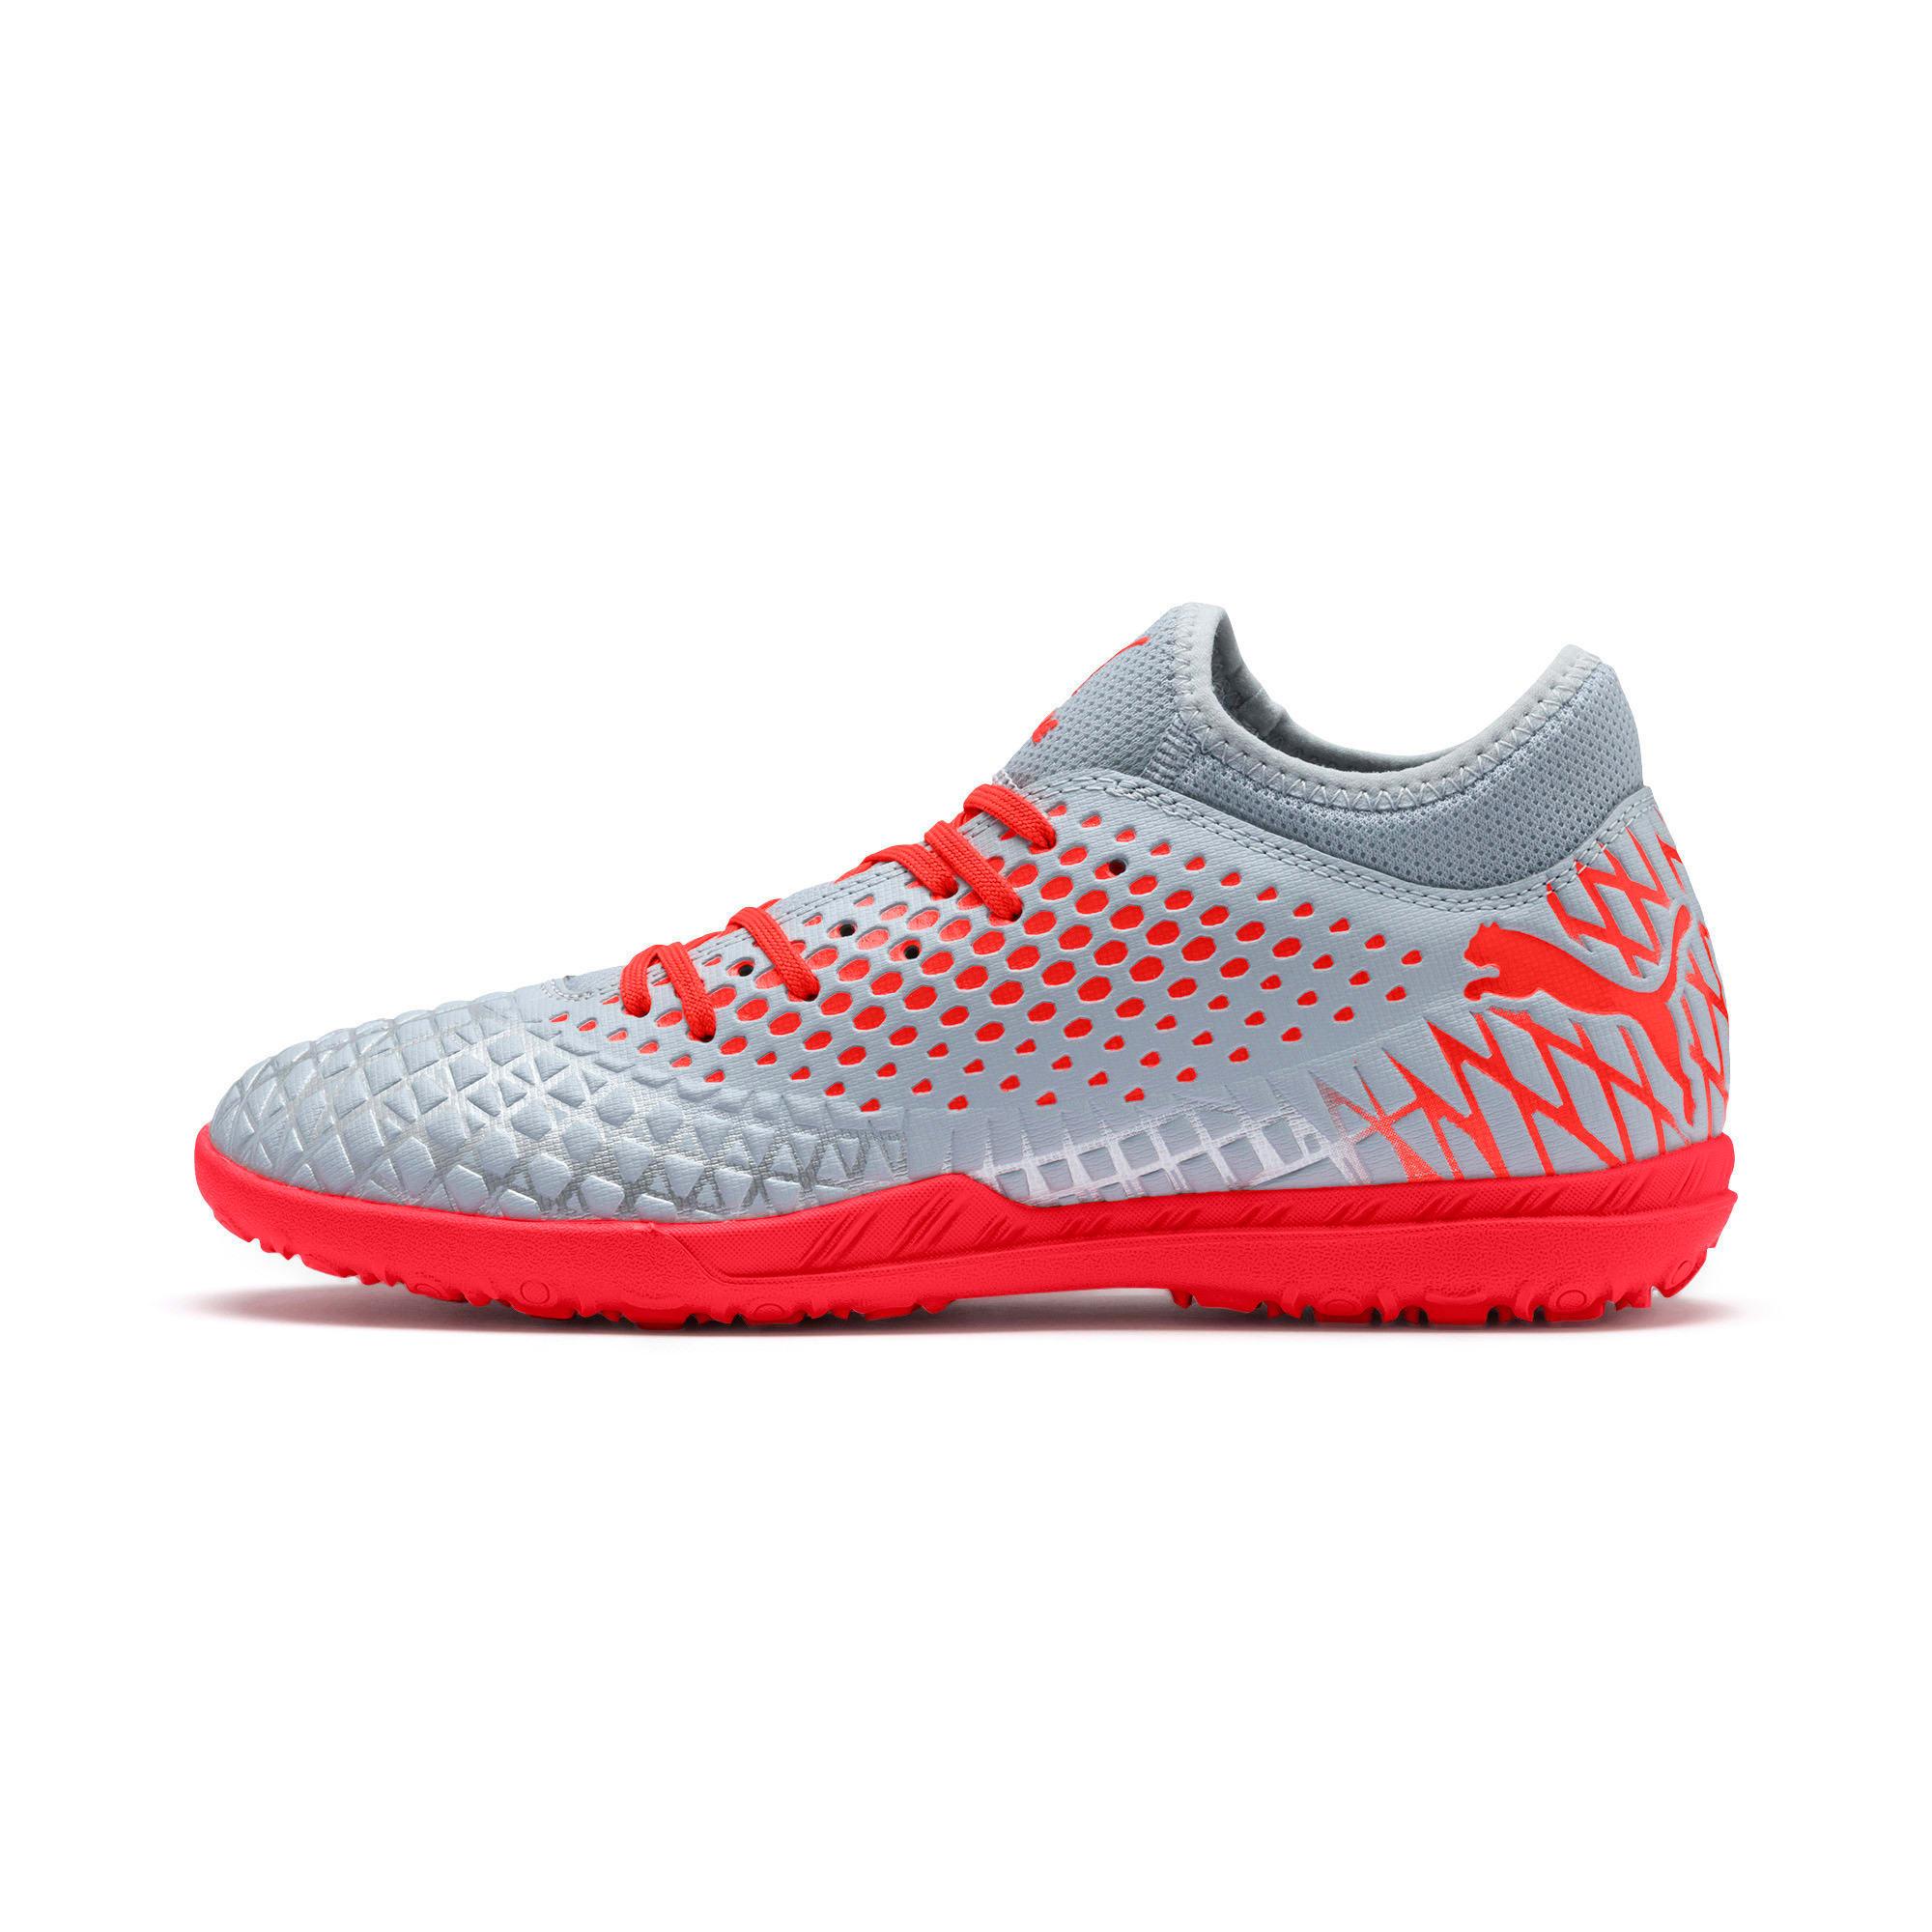 Thumbnail 1 of FUTURE 4.4 TT Men's Soccer Shoes, Glacial Blue-Nrgy Red, medium